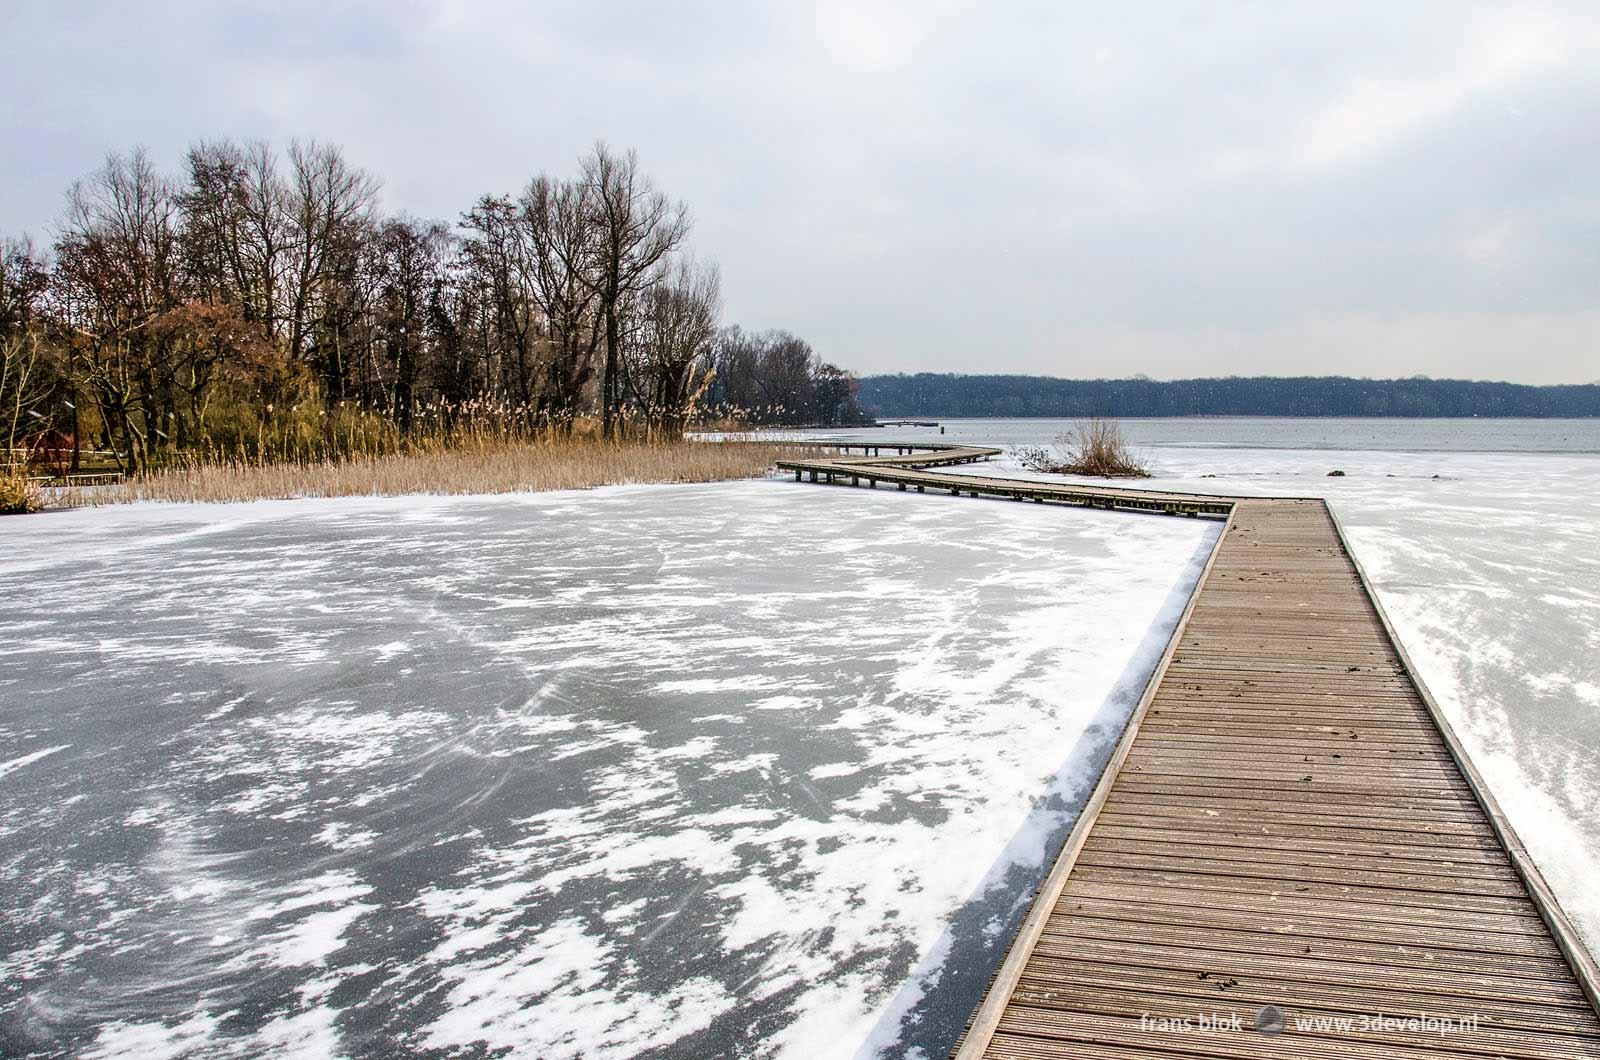 Wooden walkways across the frozen and snow-covered Lake Kralingen in Rotterdam